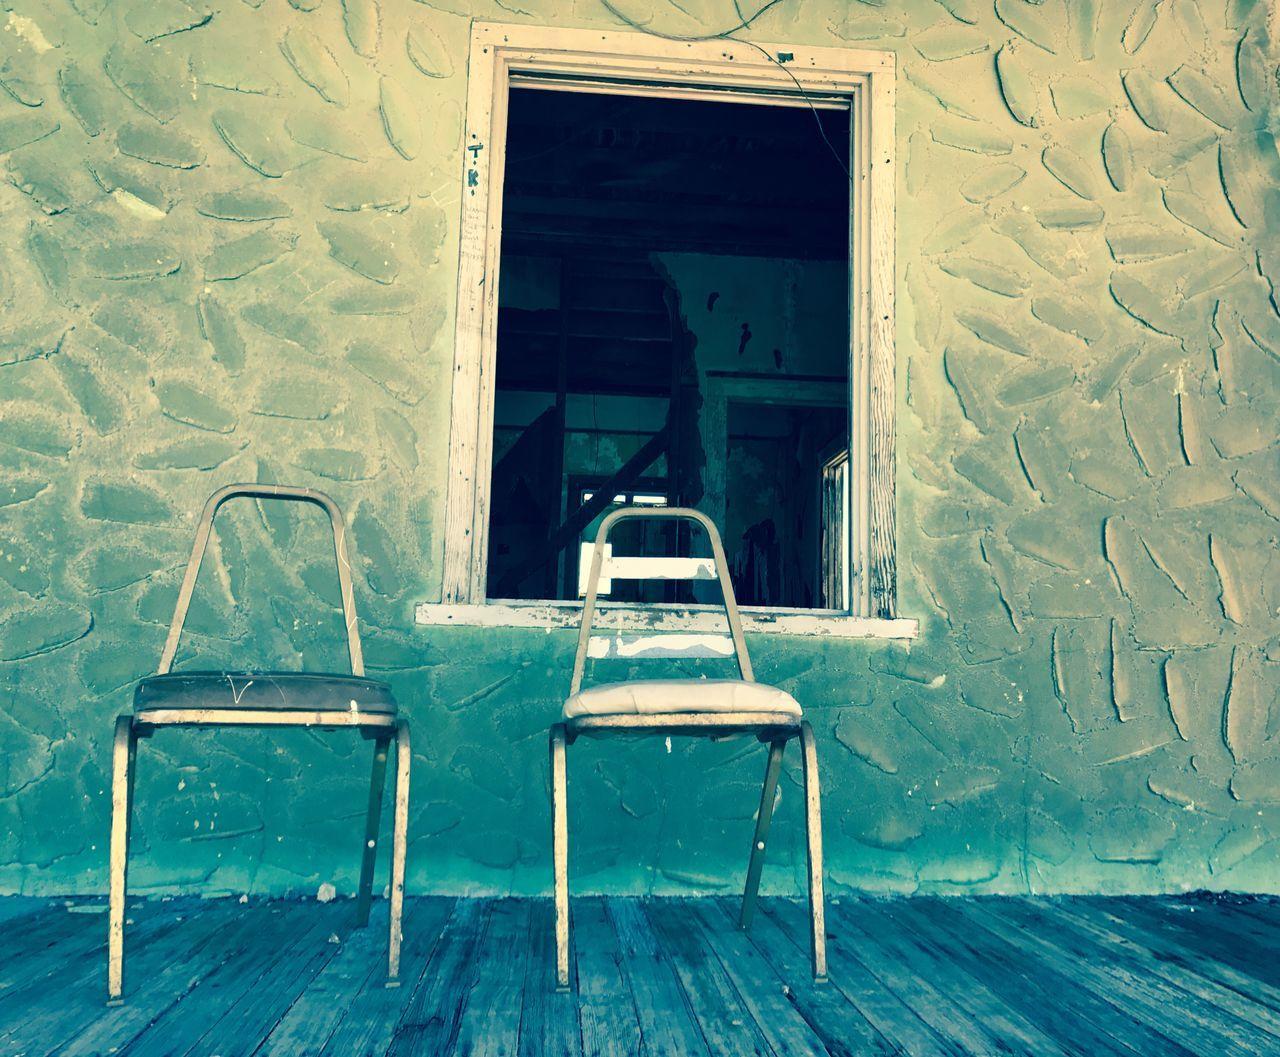 chair, no people, indoors, table, open door, day, architecture